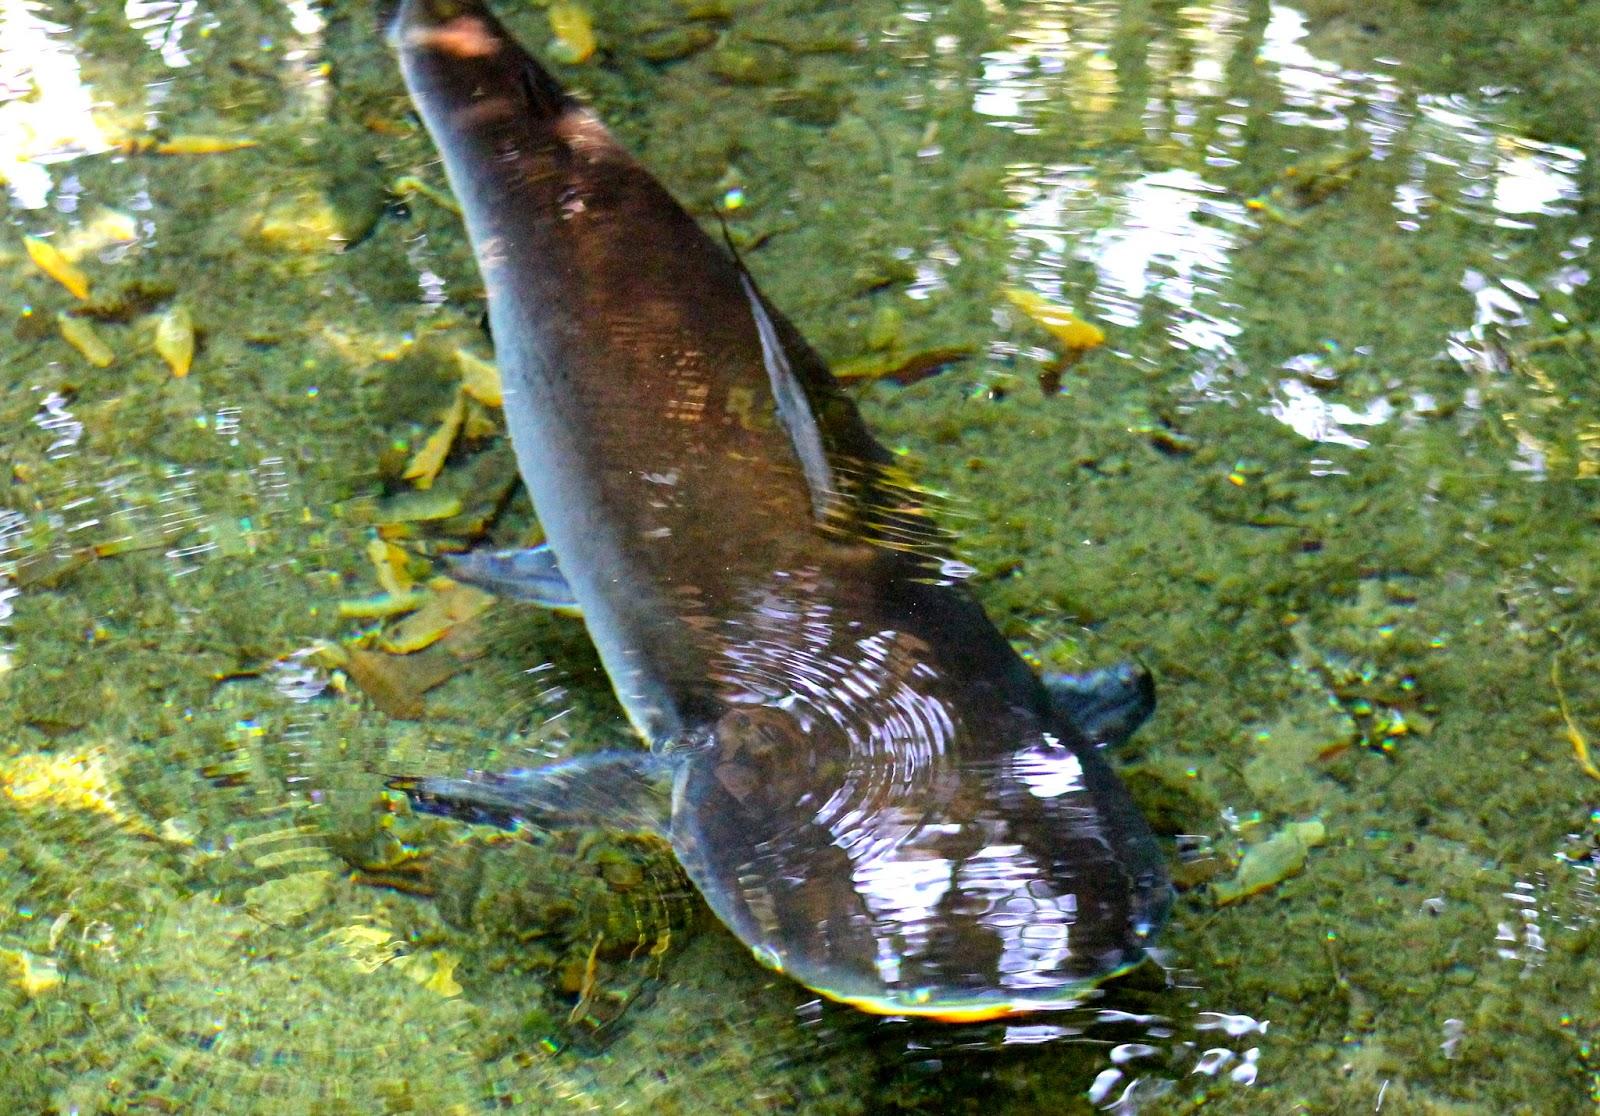 Catfish Habitat | Safari Mike Paroon Shark Catfish